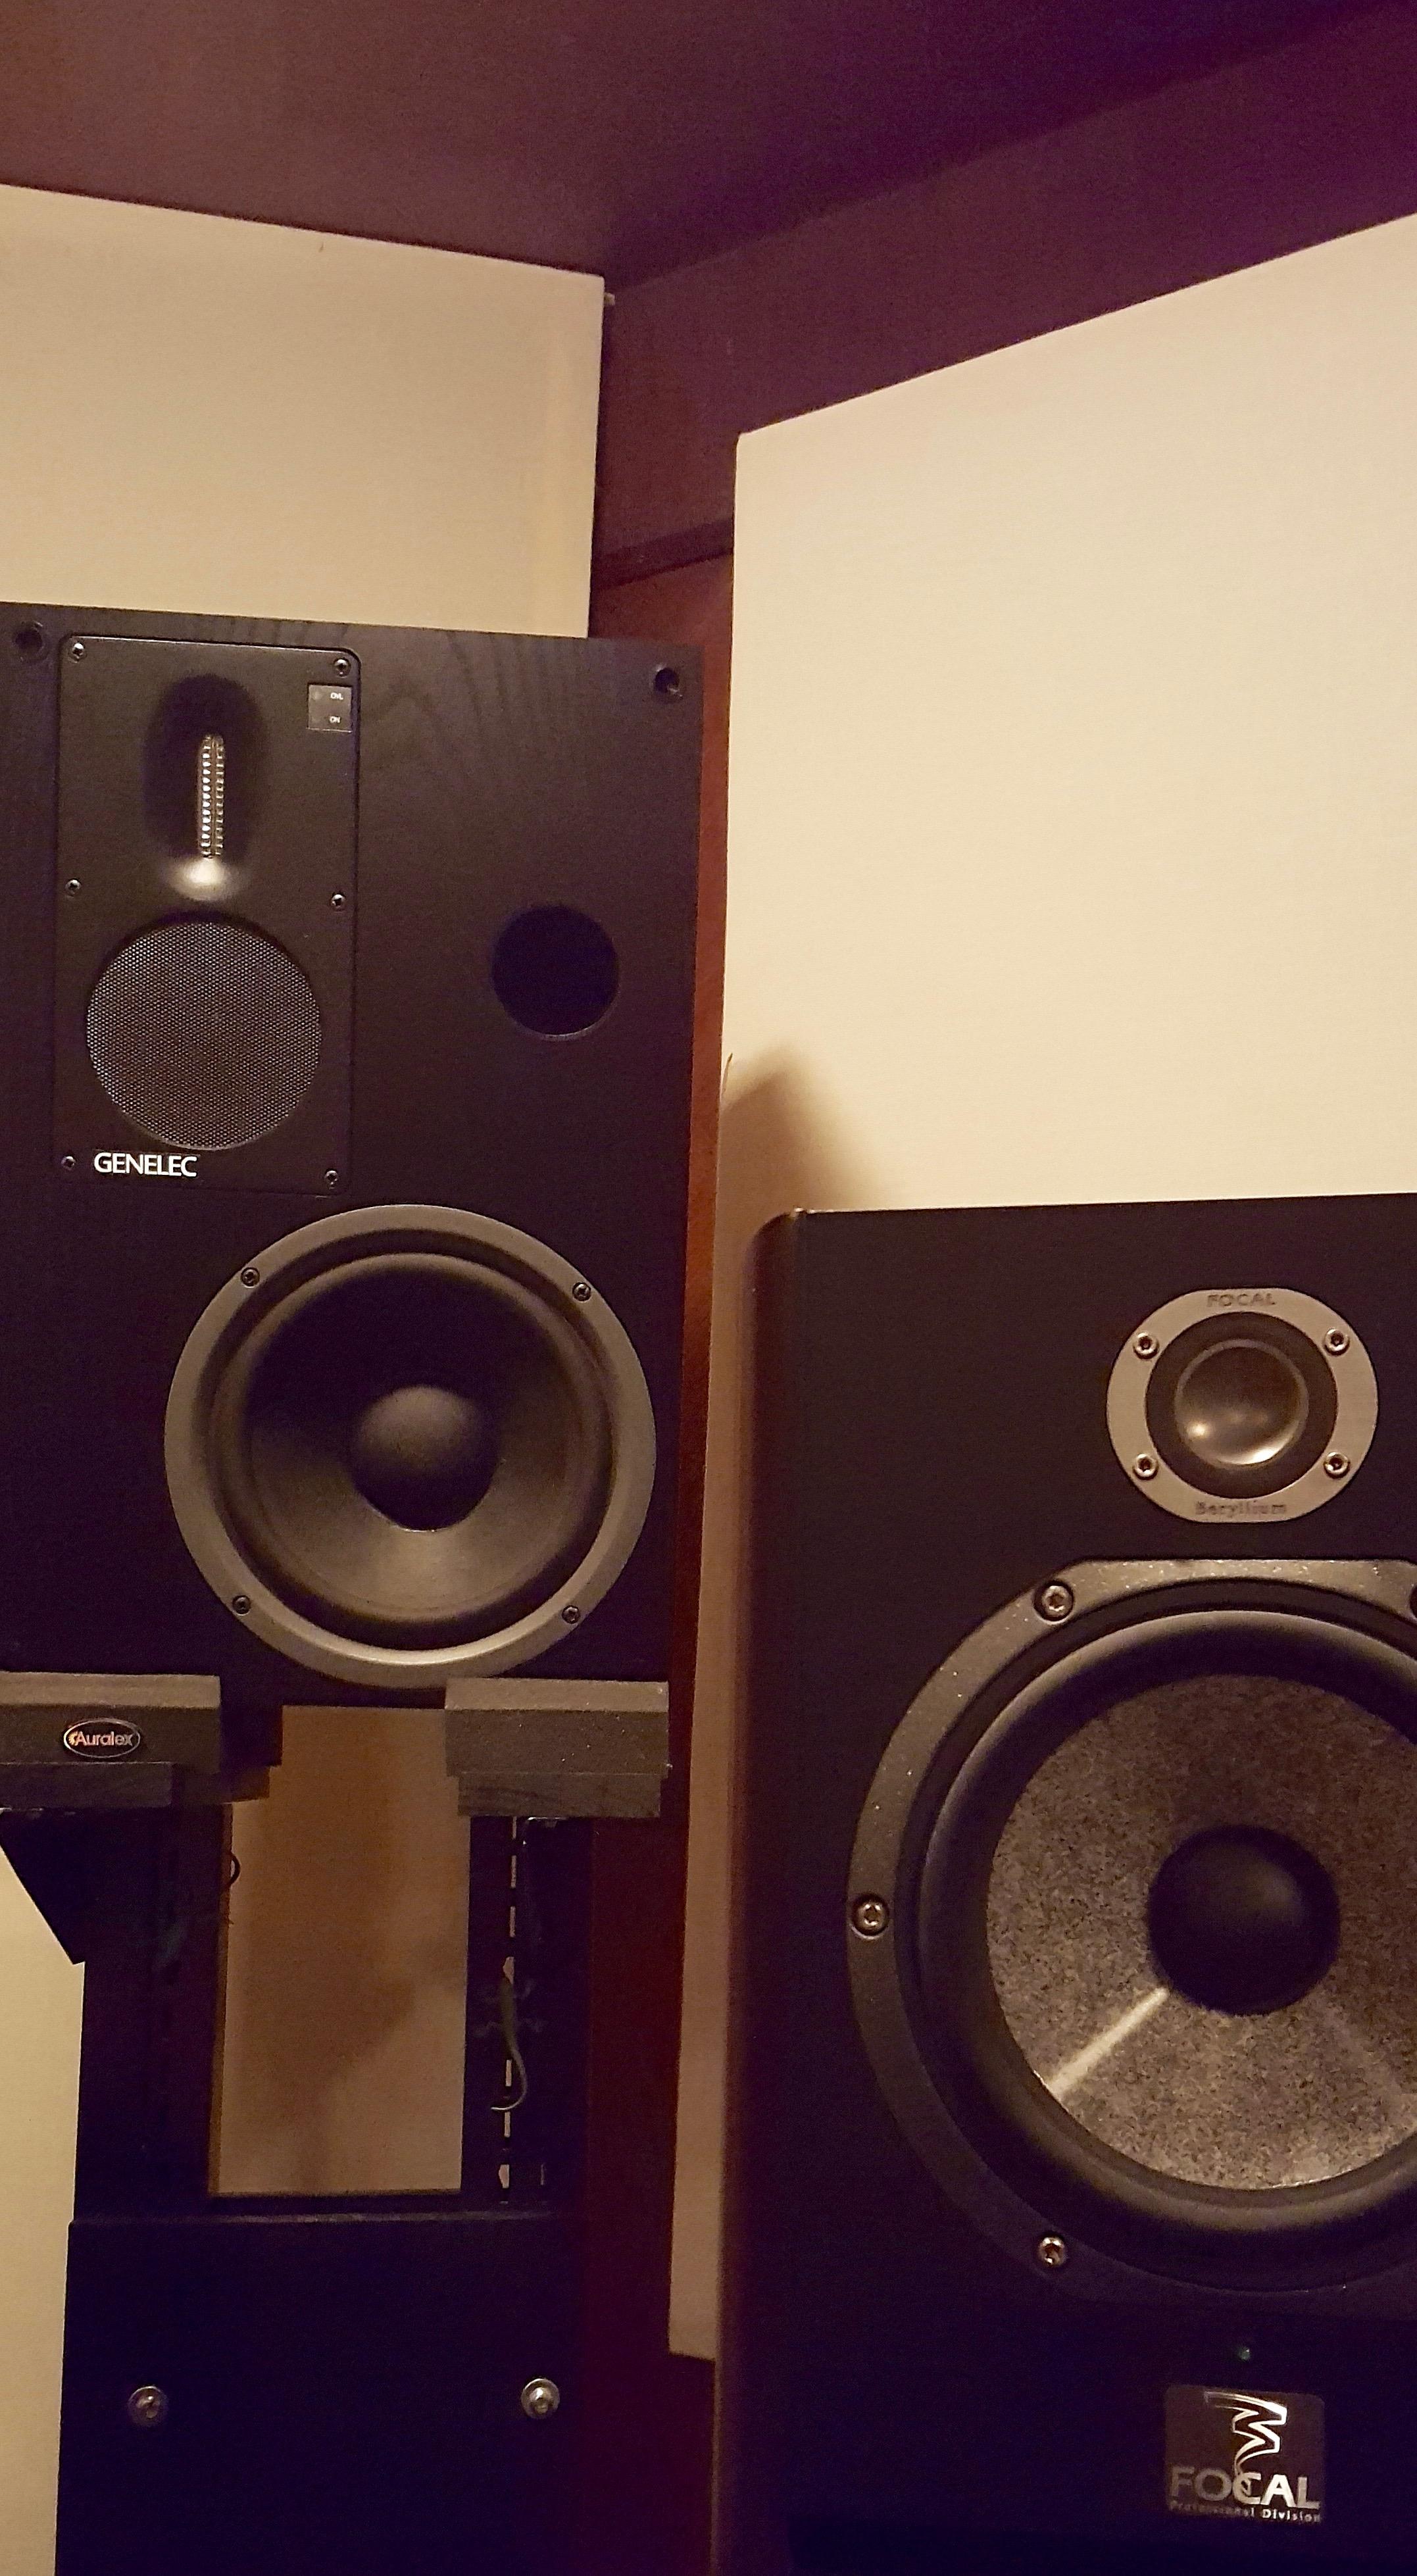 Genelec and Focal monitors